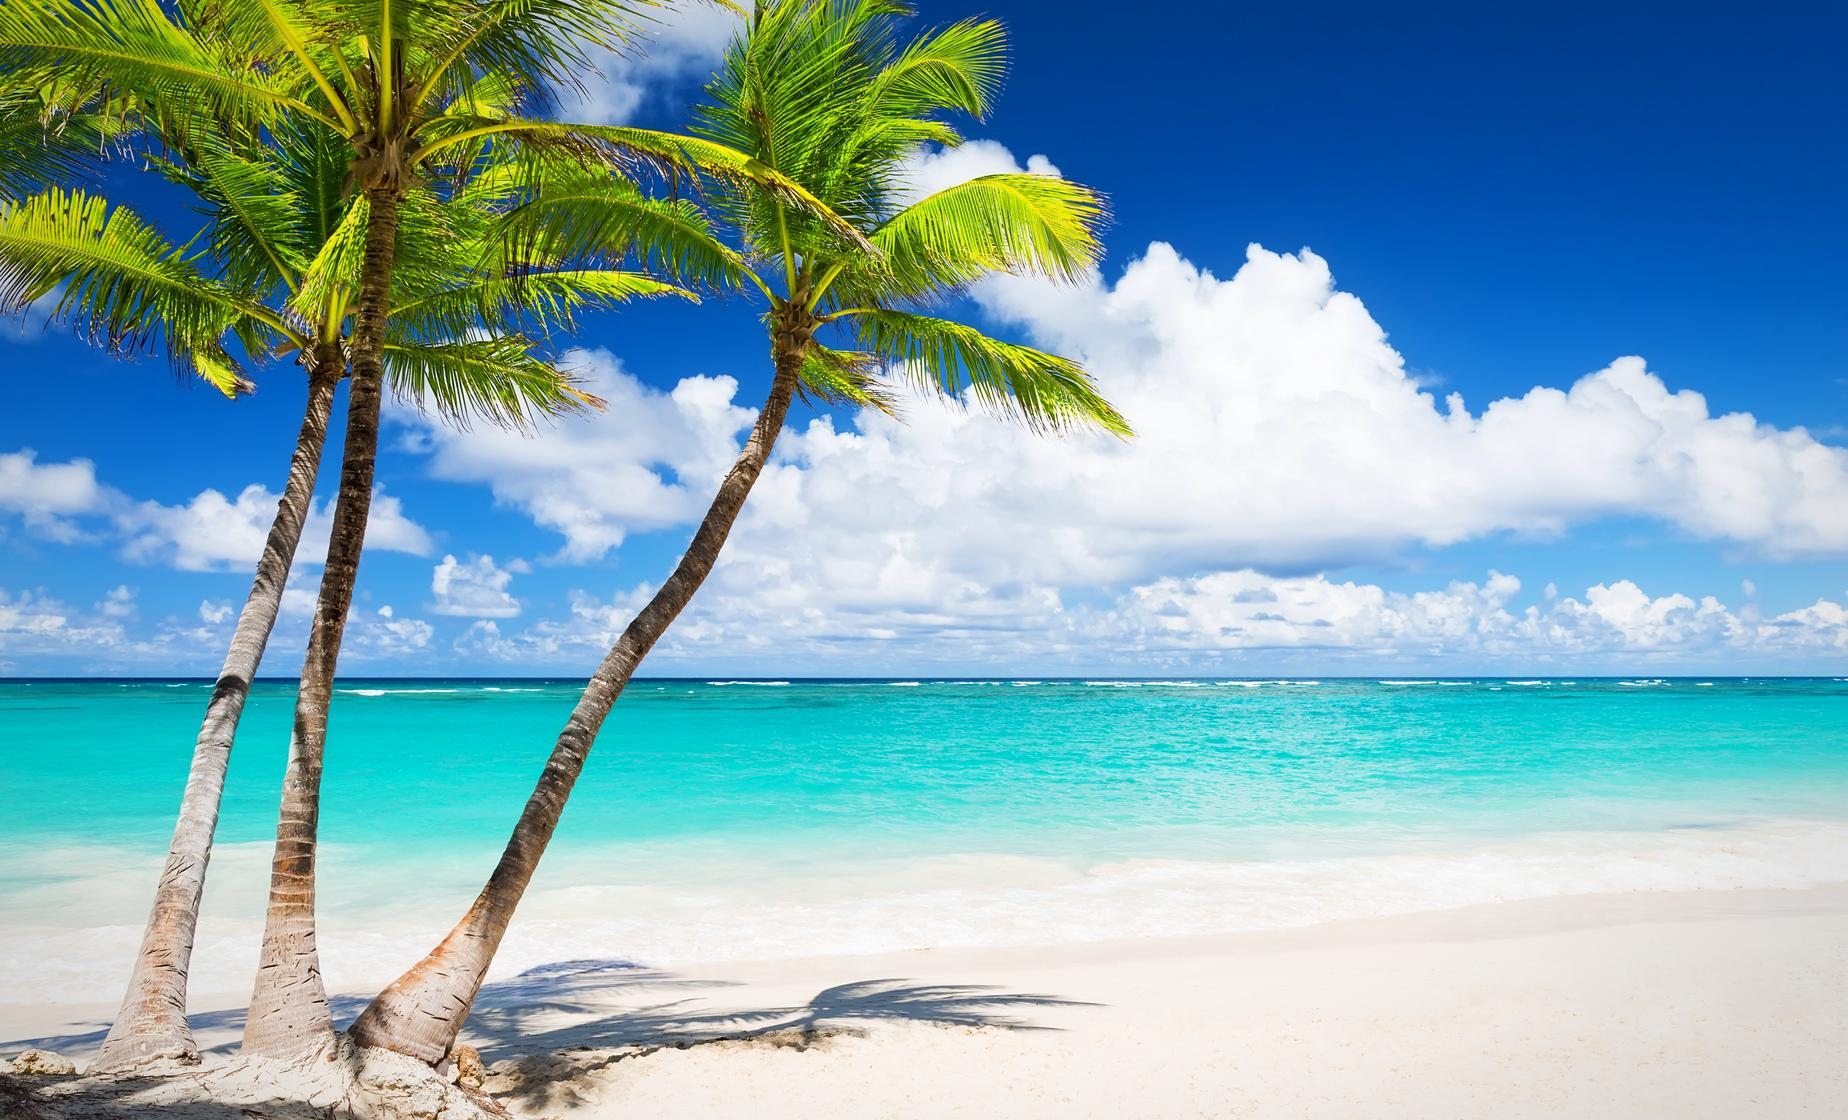 Cozumel Passion Island Tour